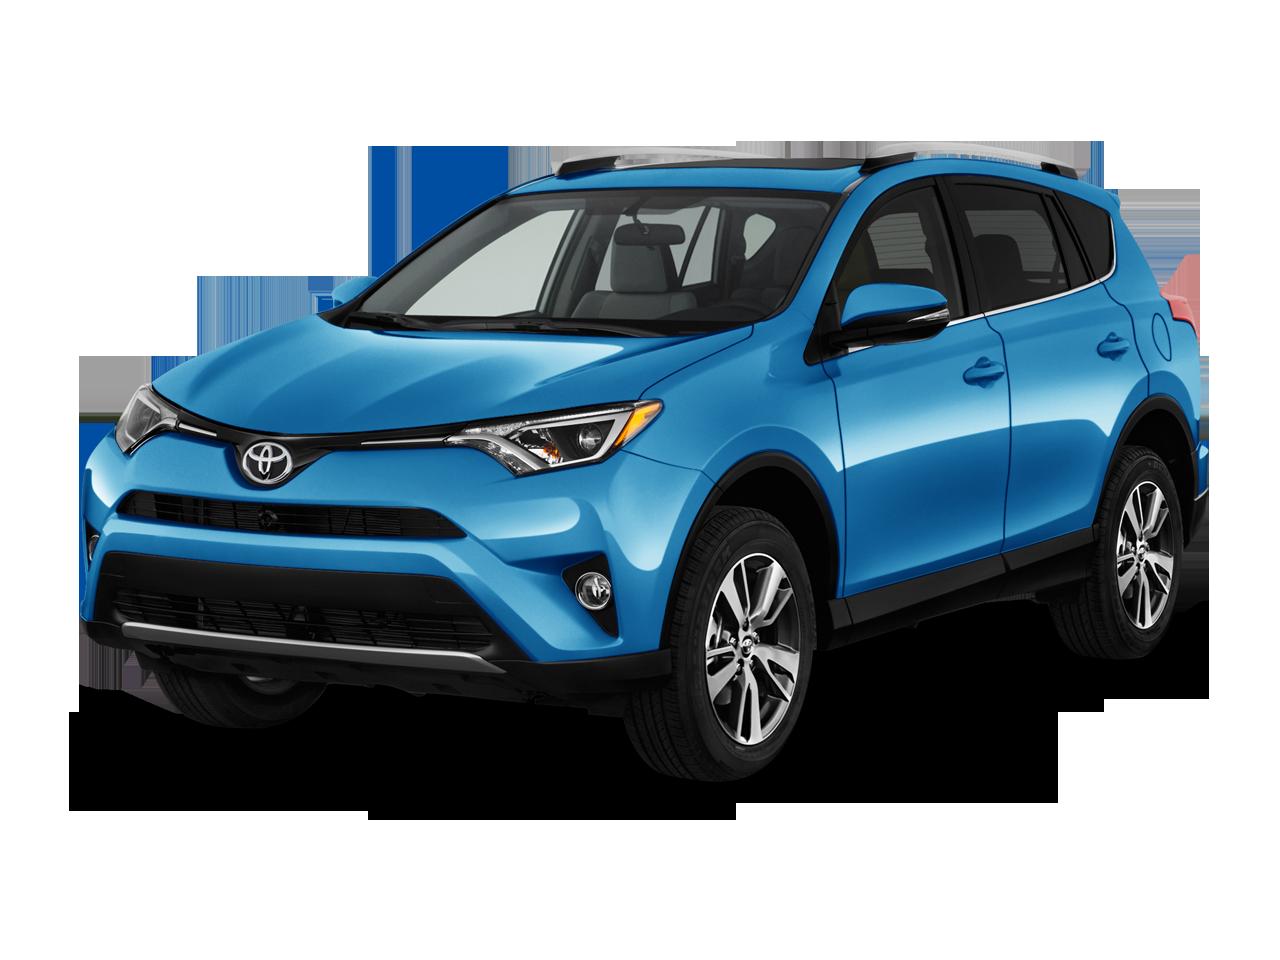 New 2018 Toyota Rav4 Xle In Milpitas Ca Piercey Toyota